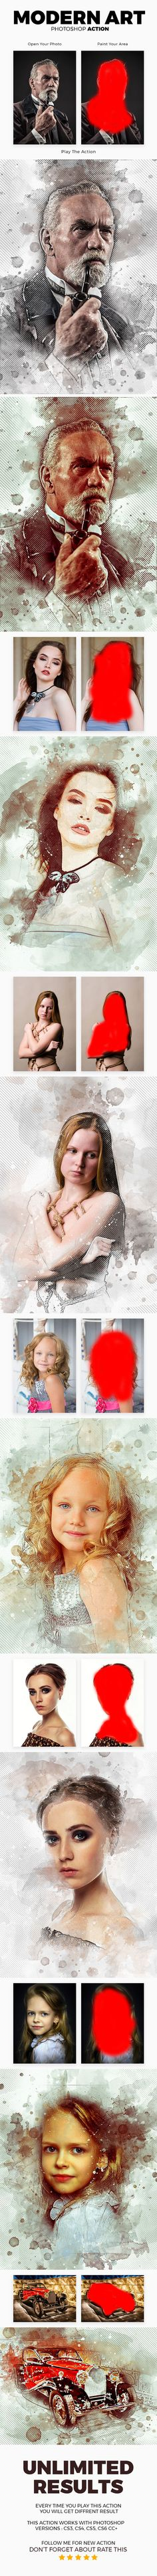 ModernArt Photoshop Action